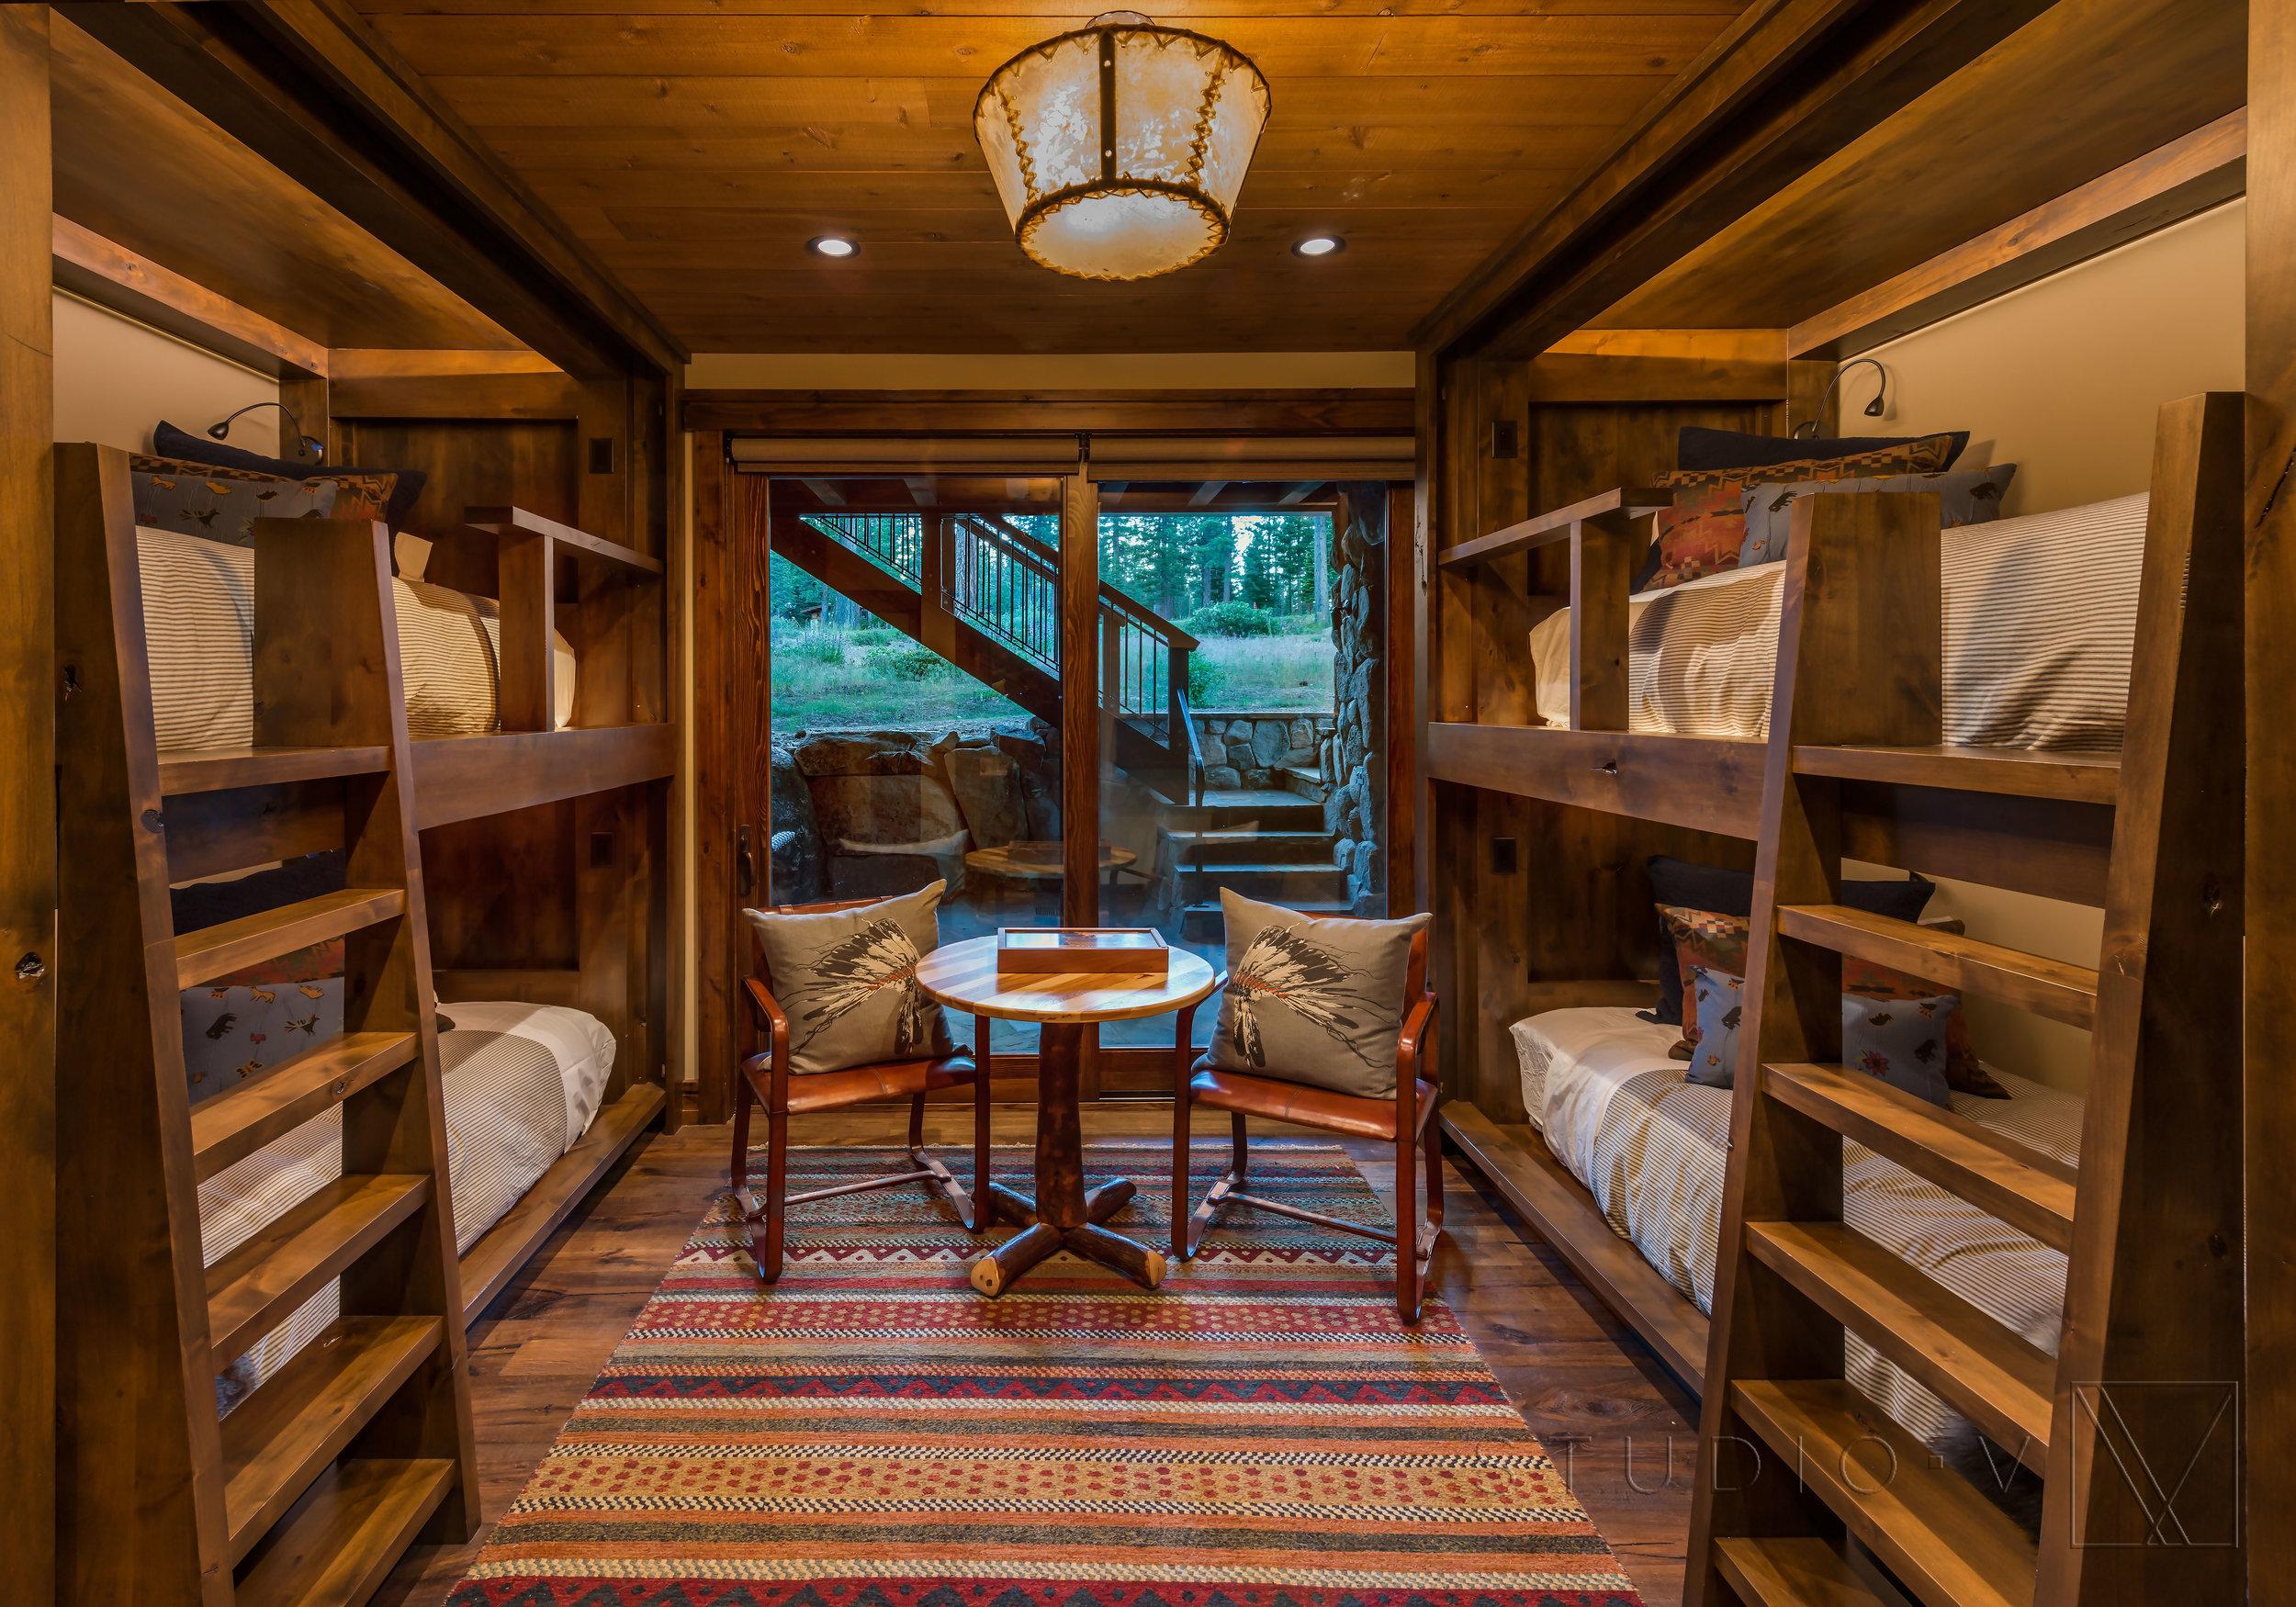 Lodge Cabin Tahoe Truckee Martis Camp CA California Traditional Studio V Interior Architecture Design Scottsdale Arizona AZ (21).jpg